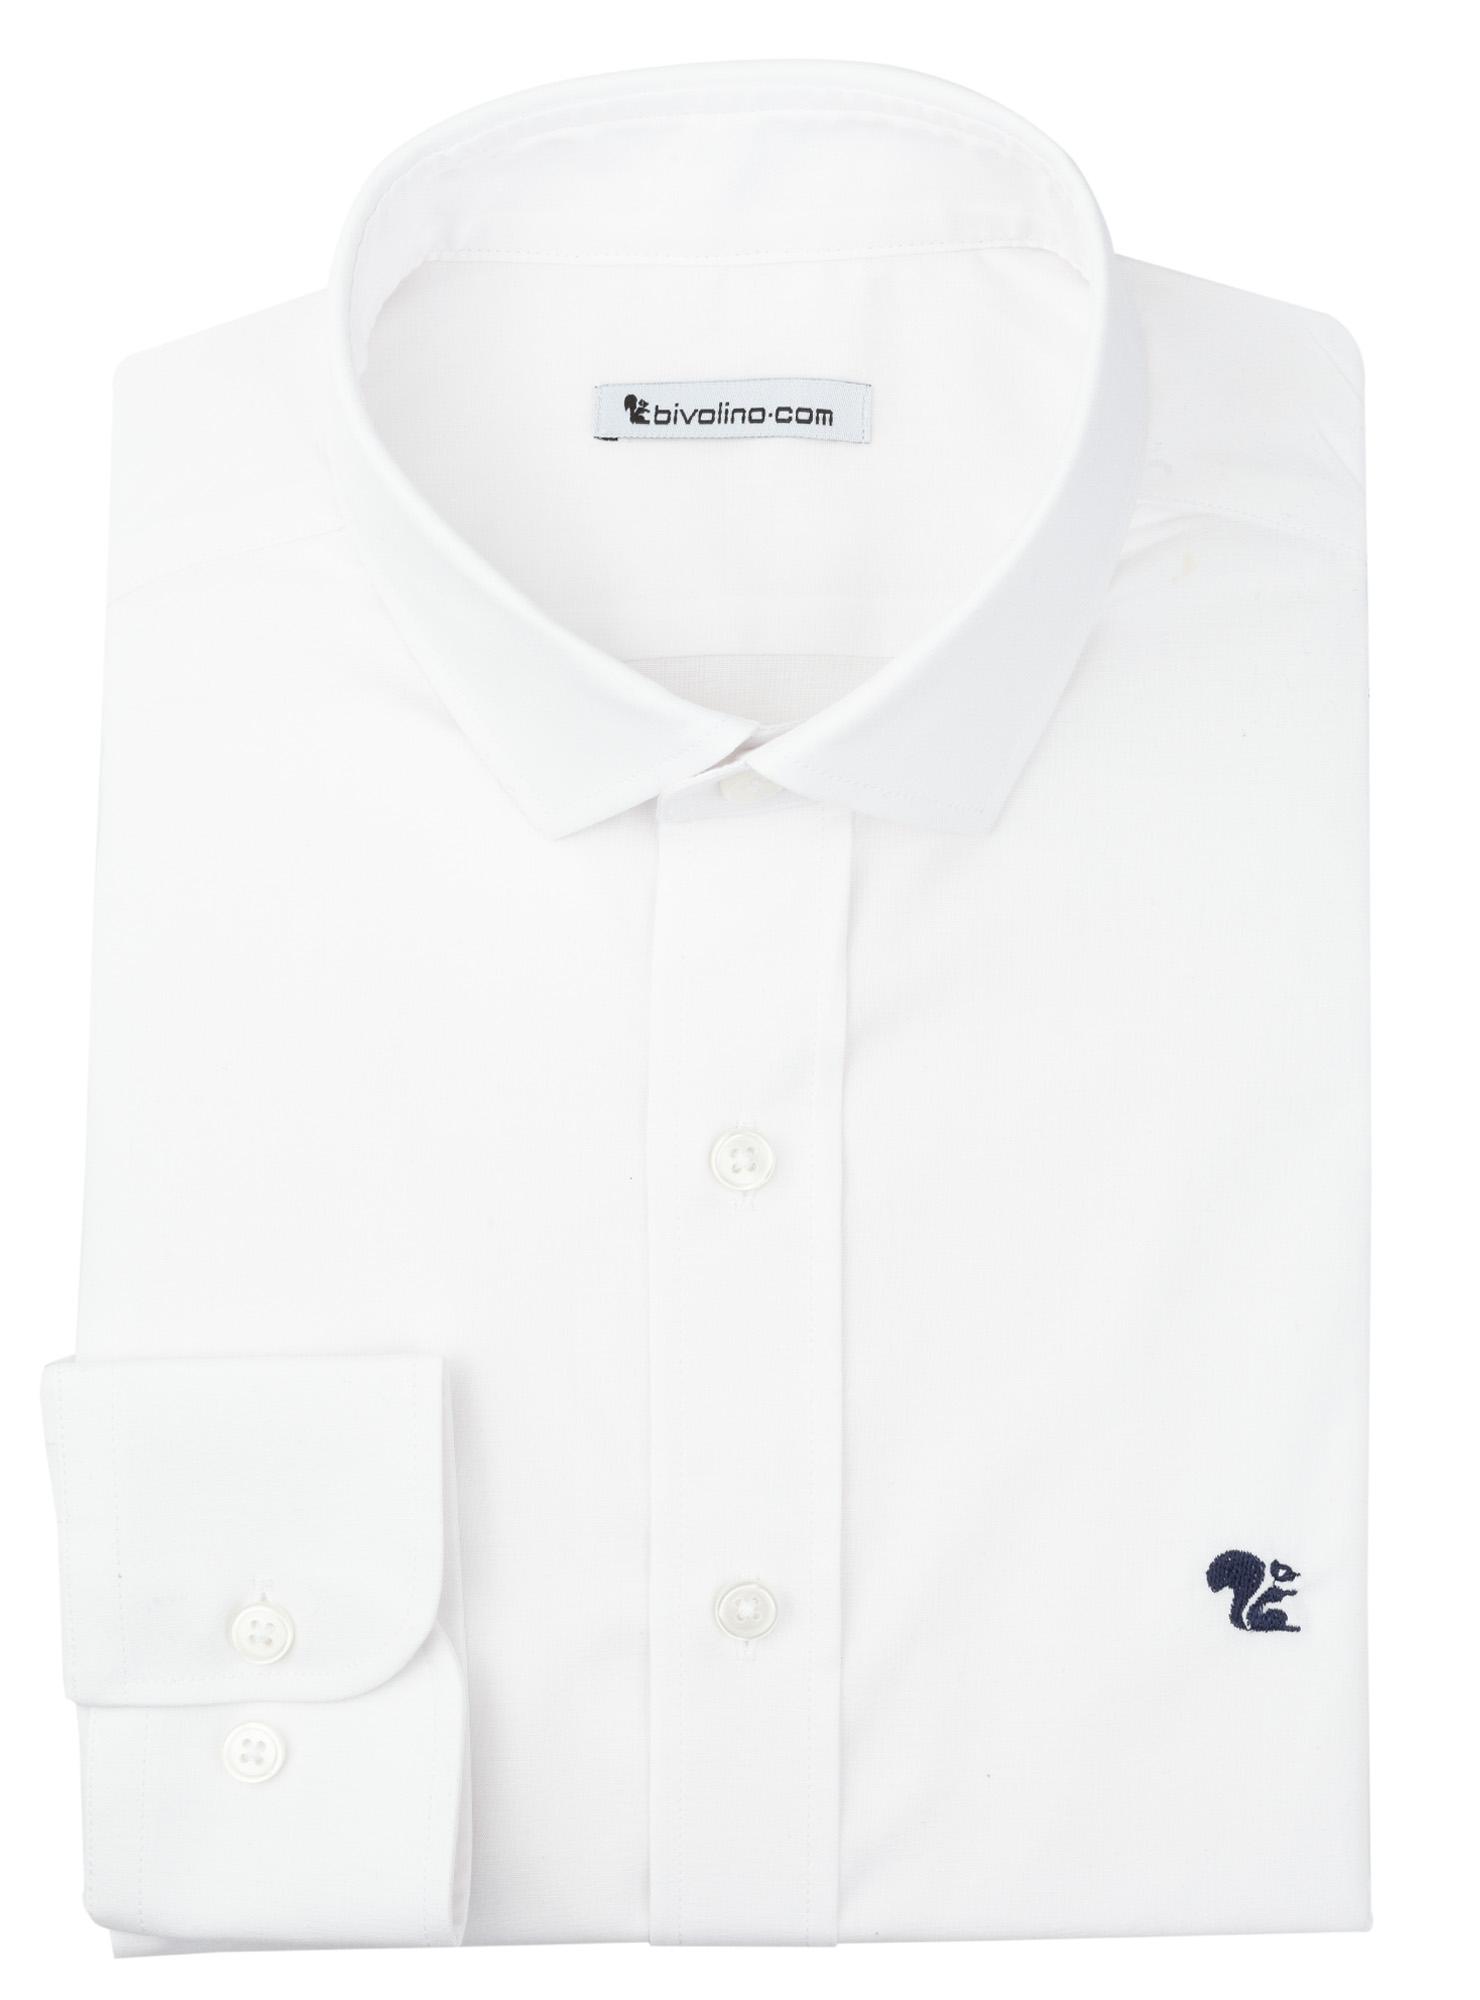 LICABRIANO - Chemise Homme coton stretch - Reso 2